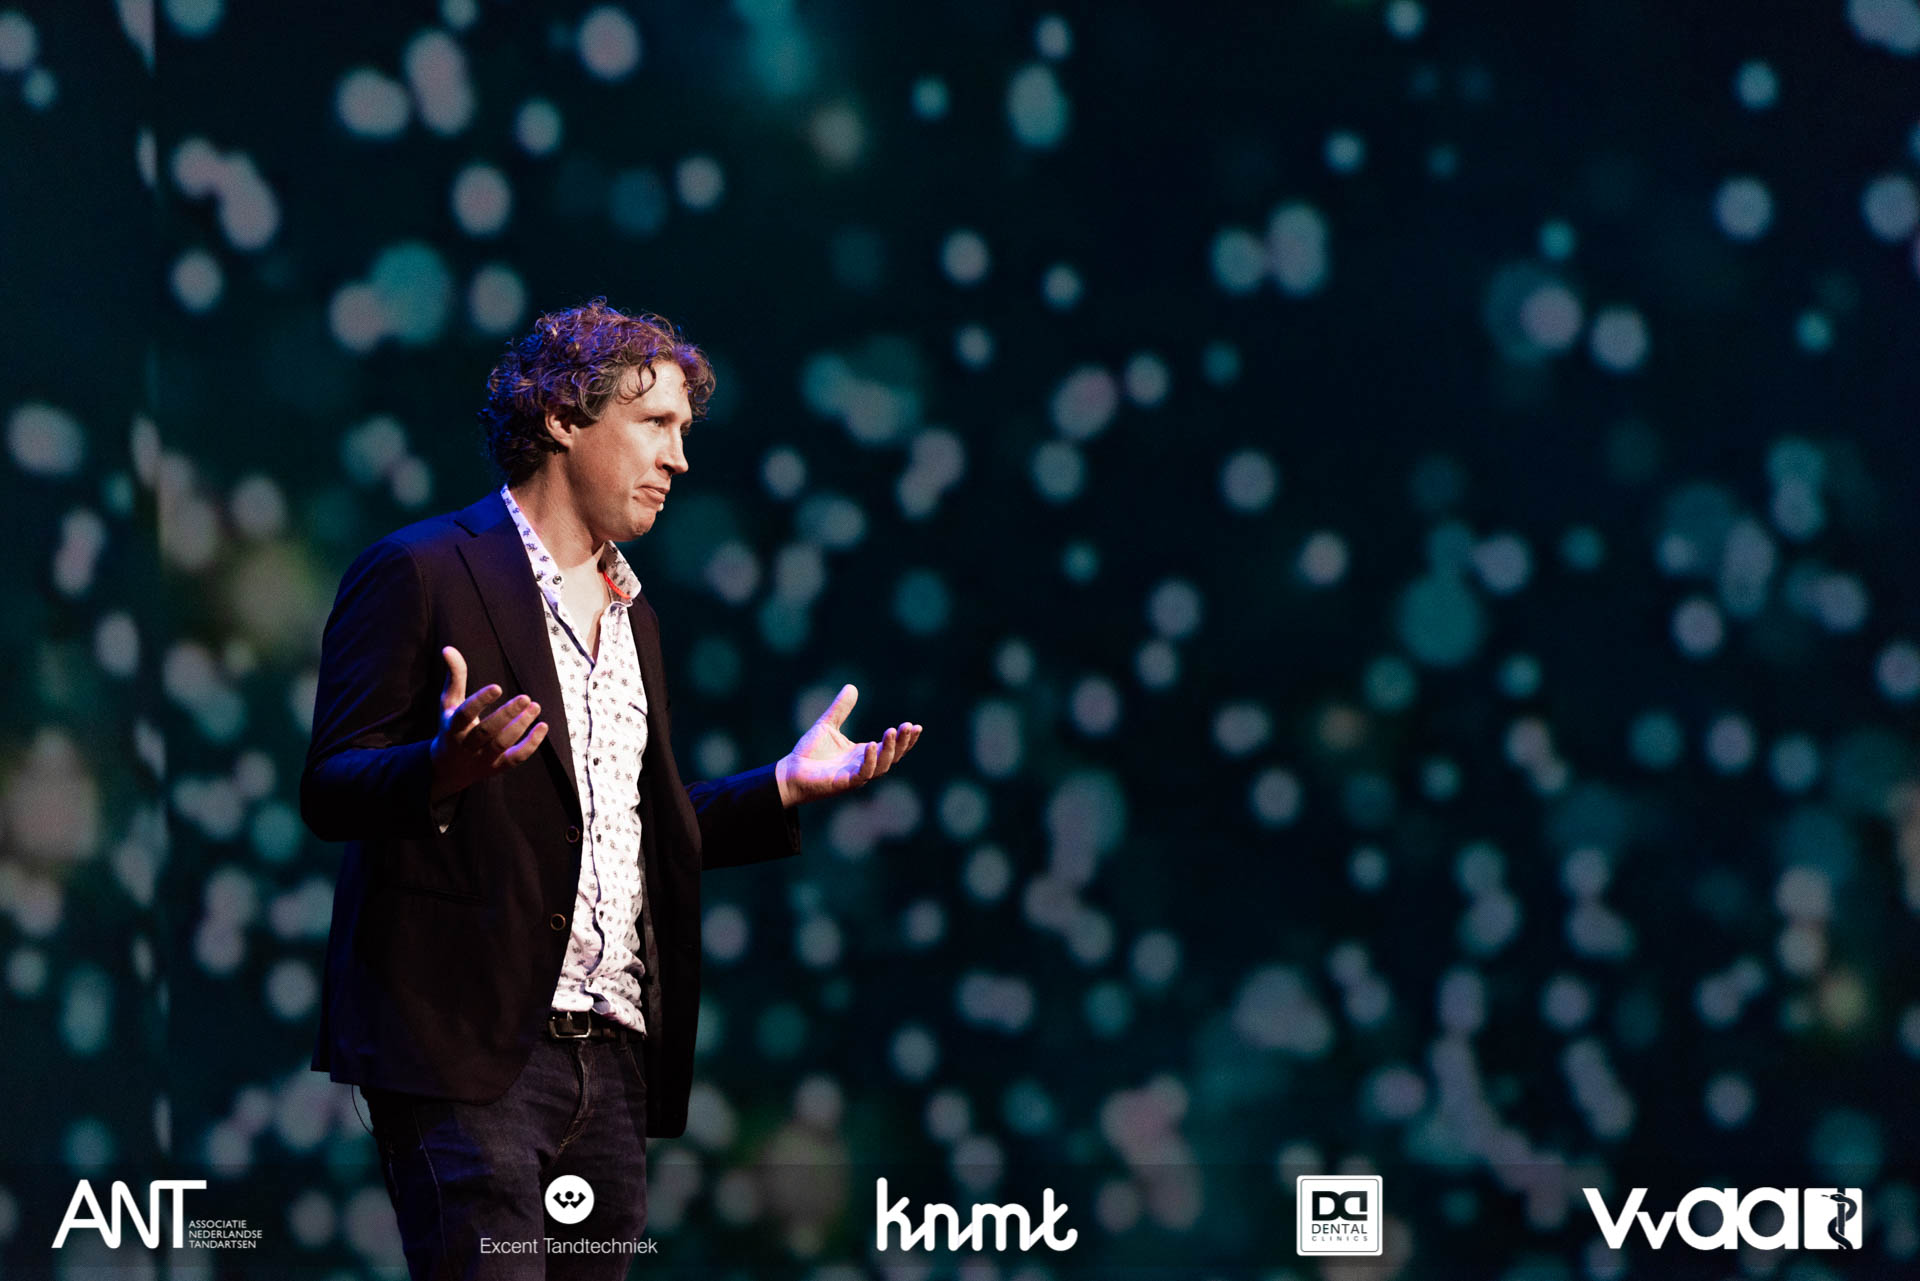 Jan Willem Vaartjes | Kickstart 2018 & Kickstart 360º